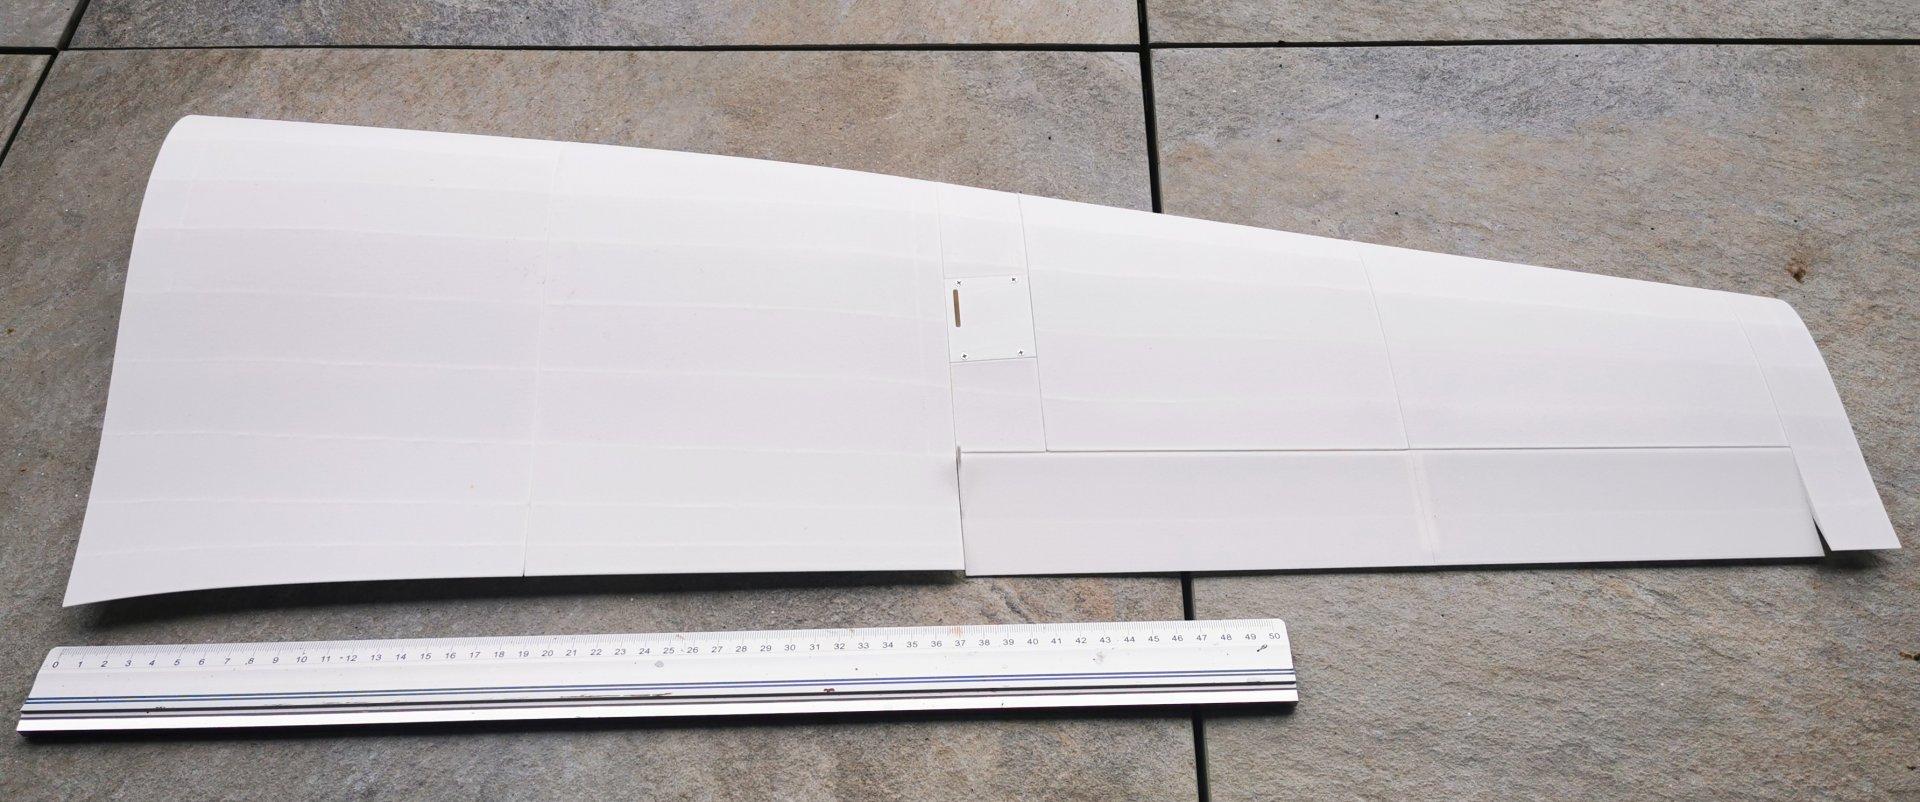 Wing-1600.jpg